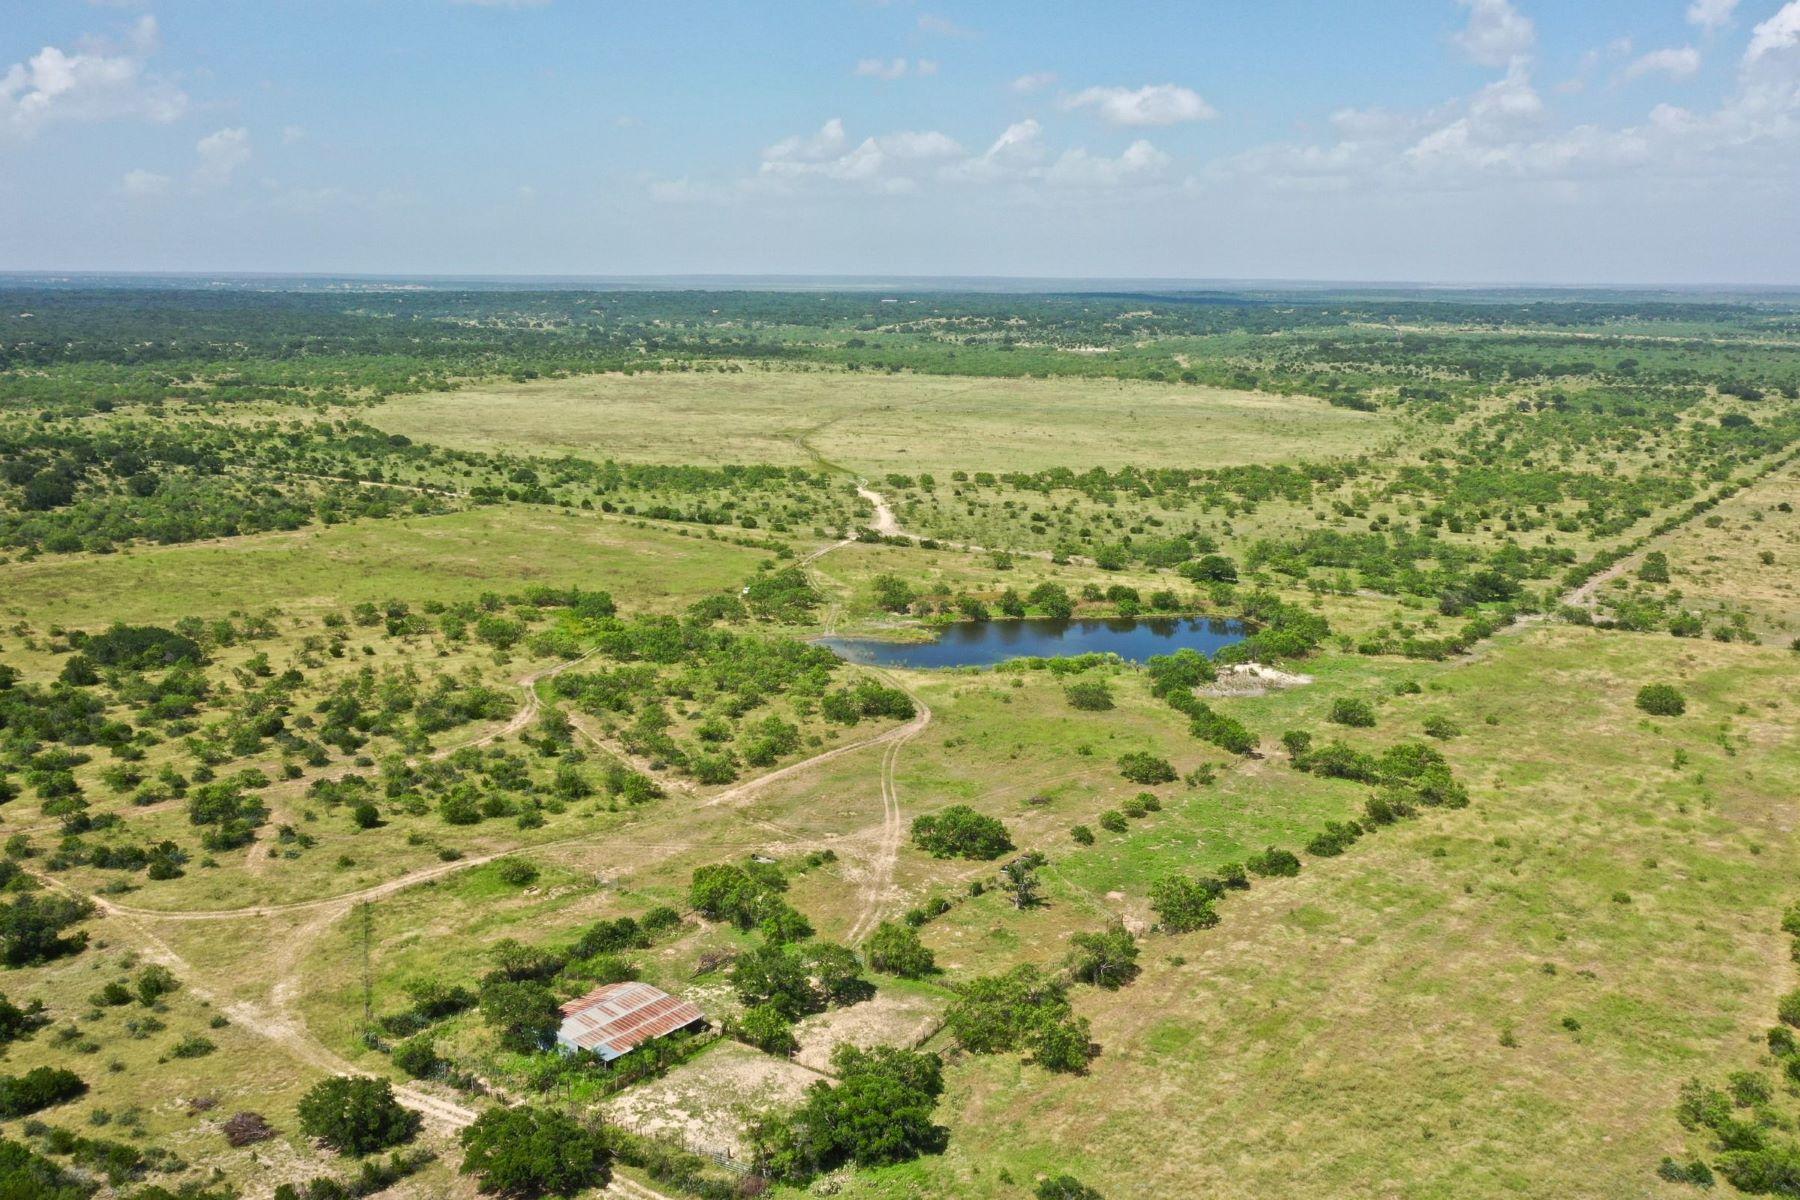 Additional photo for property listing at 7,800± ACRES SAN SABA RIVER RANCH 7,800+/- Acres / Menard County Menard, 得克萨斯州 76859 美国